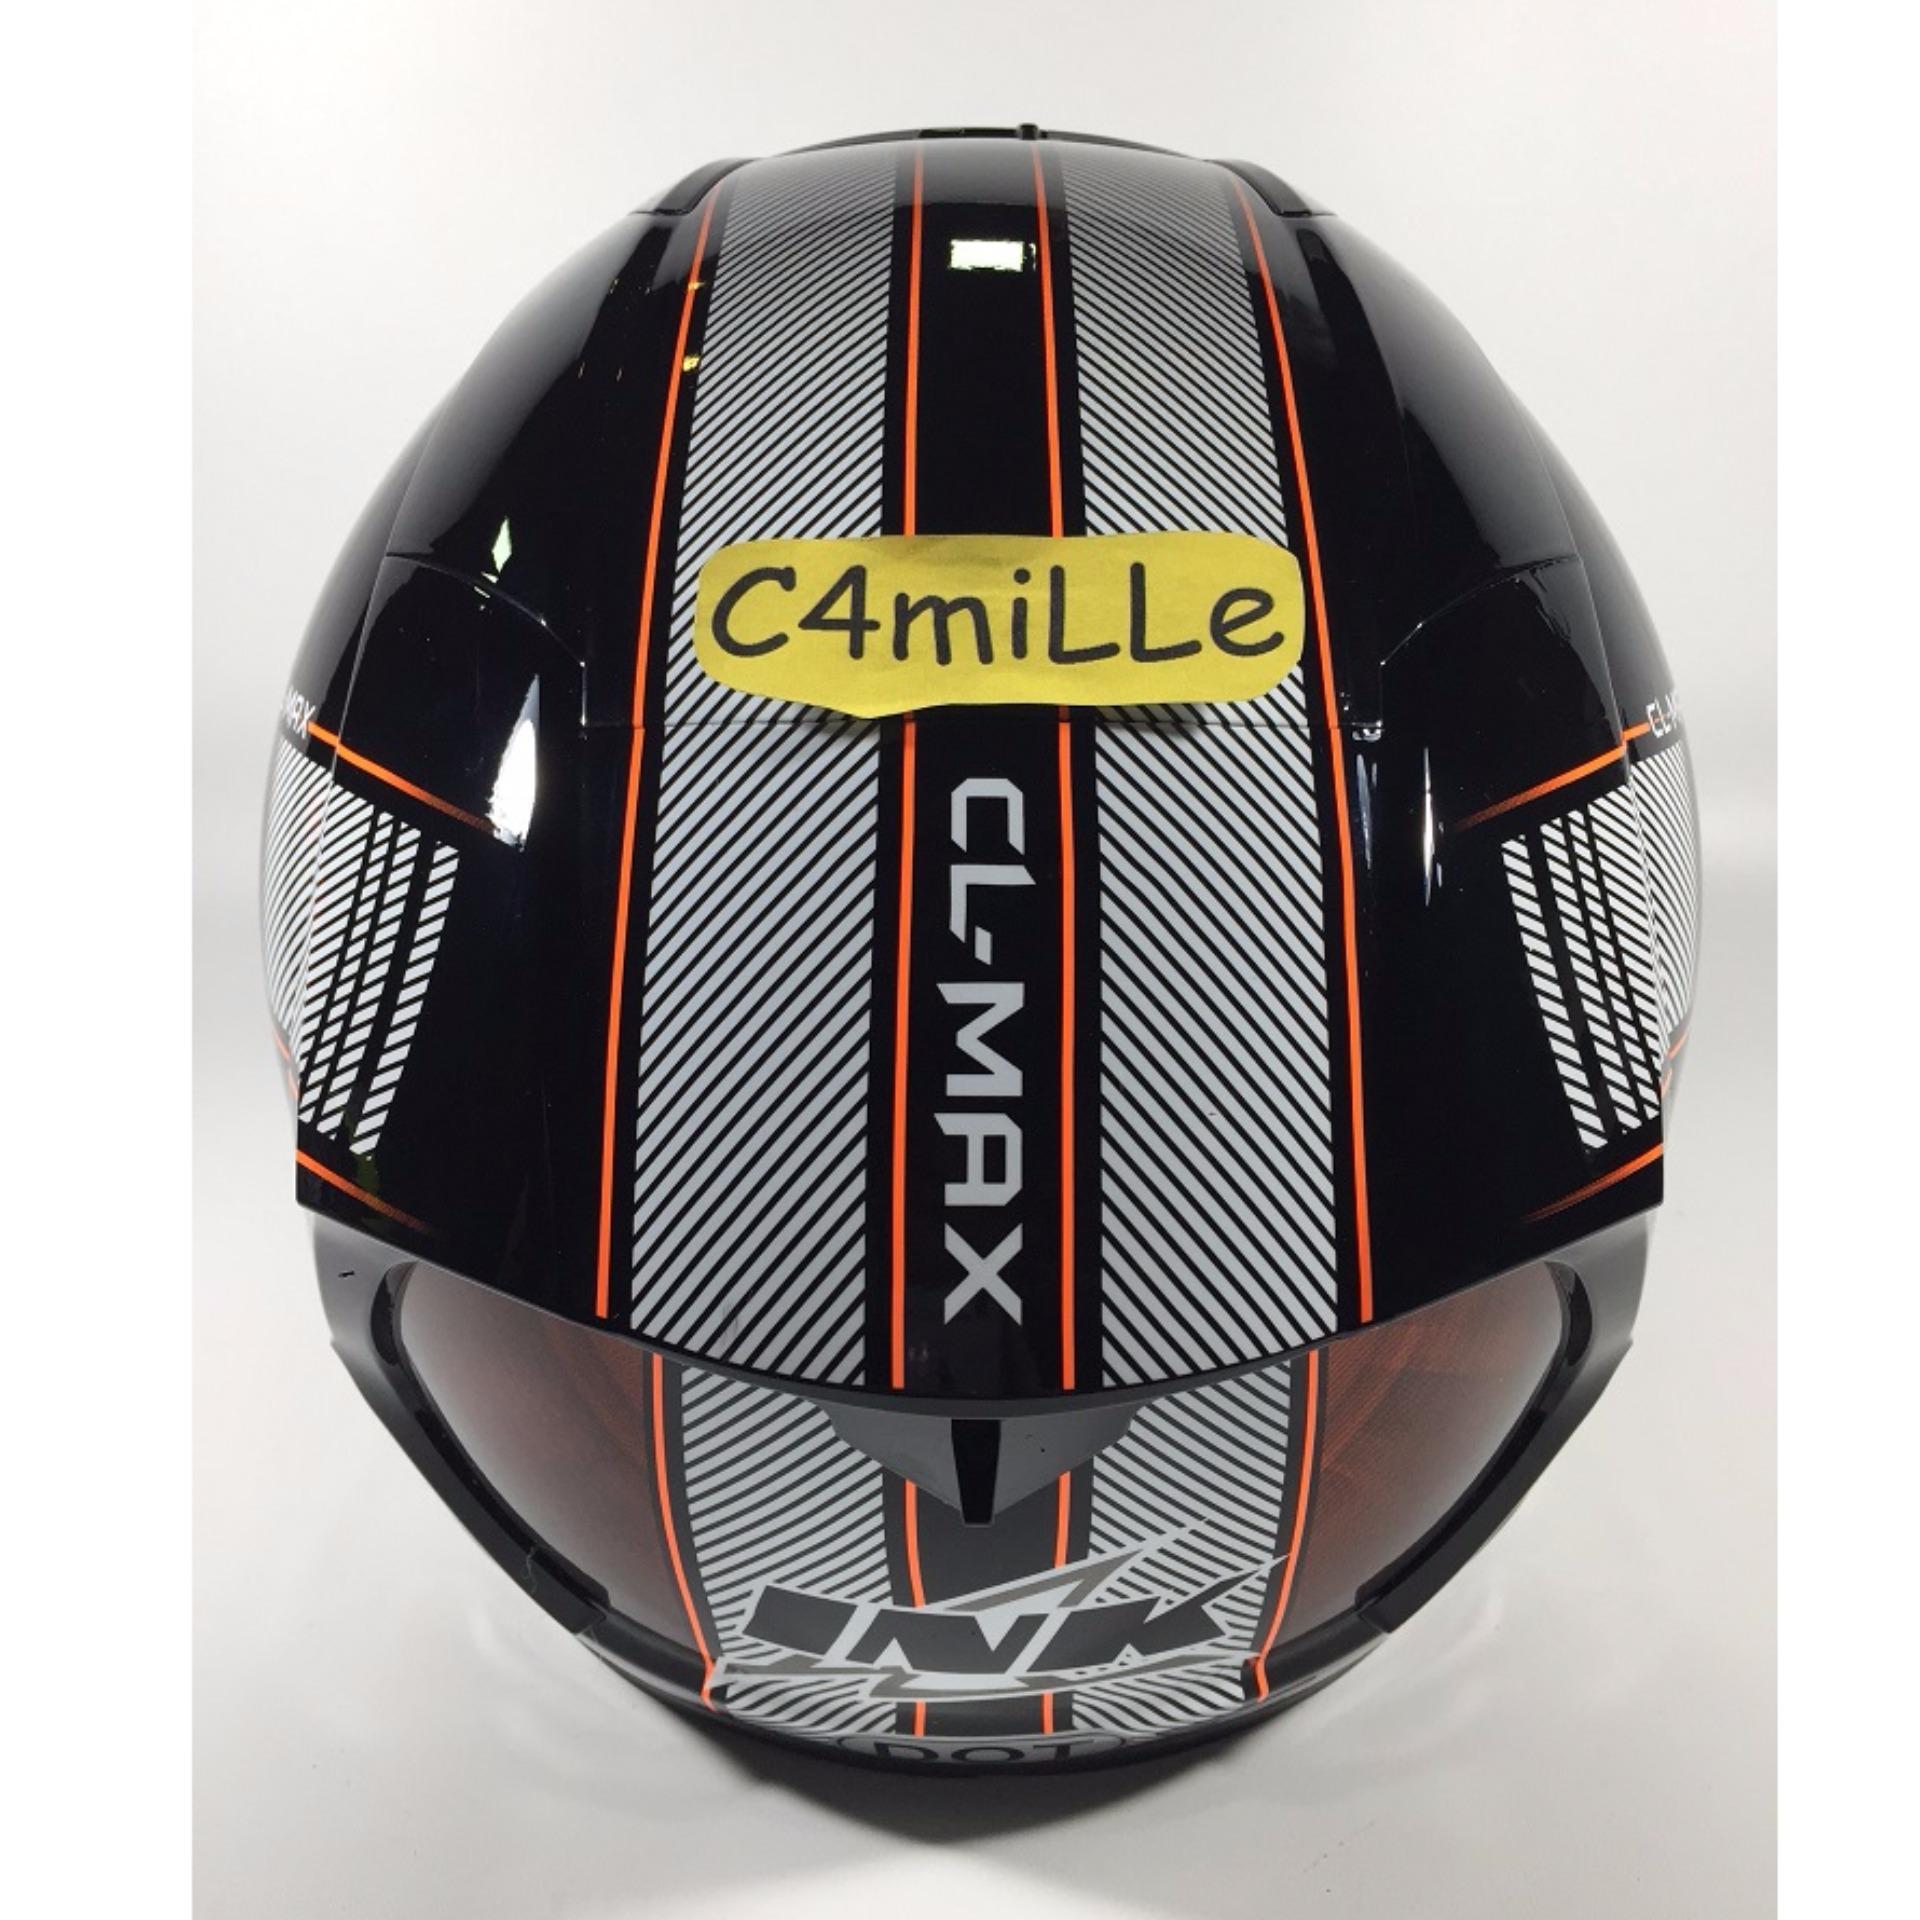 Snail Helm Modular Single Visor Ff991 Motif Kartun Daftar Harga Full Face Mx309 Motocross Skull Hitam Kilap Ink Cl Max 4 Black Orange